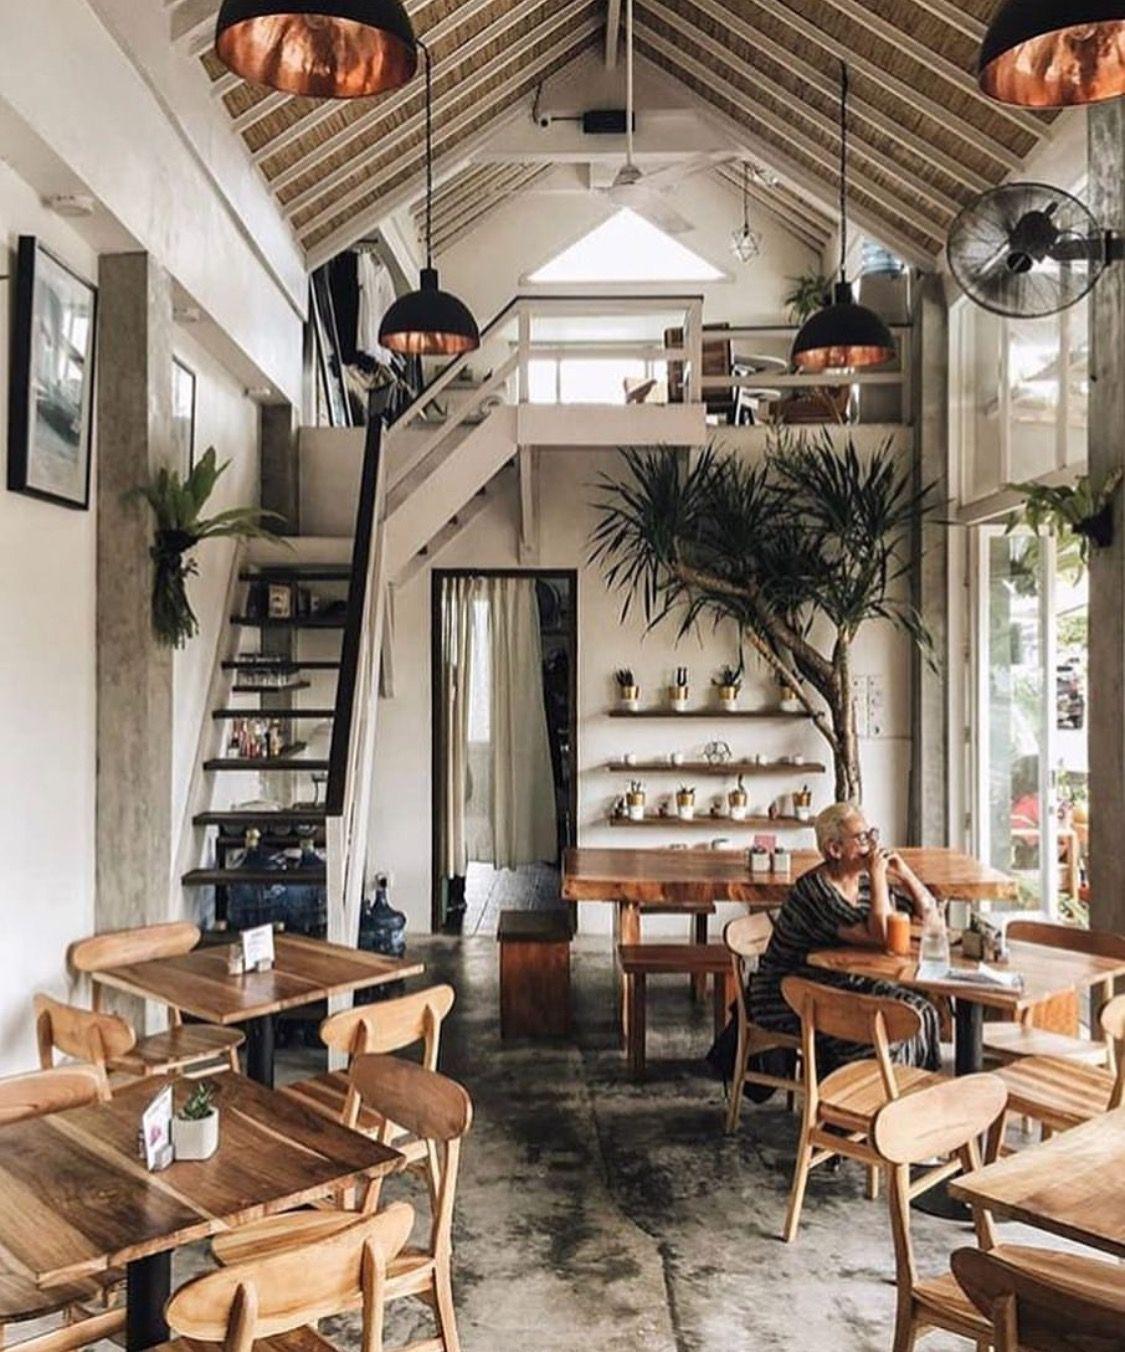 Gorgeous Coffee Shop บ านกระจก แต งบ าน การออกแบบภายในบ าน